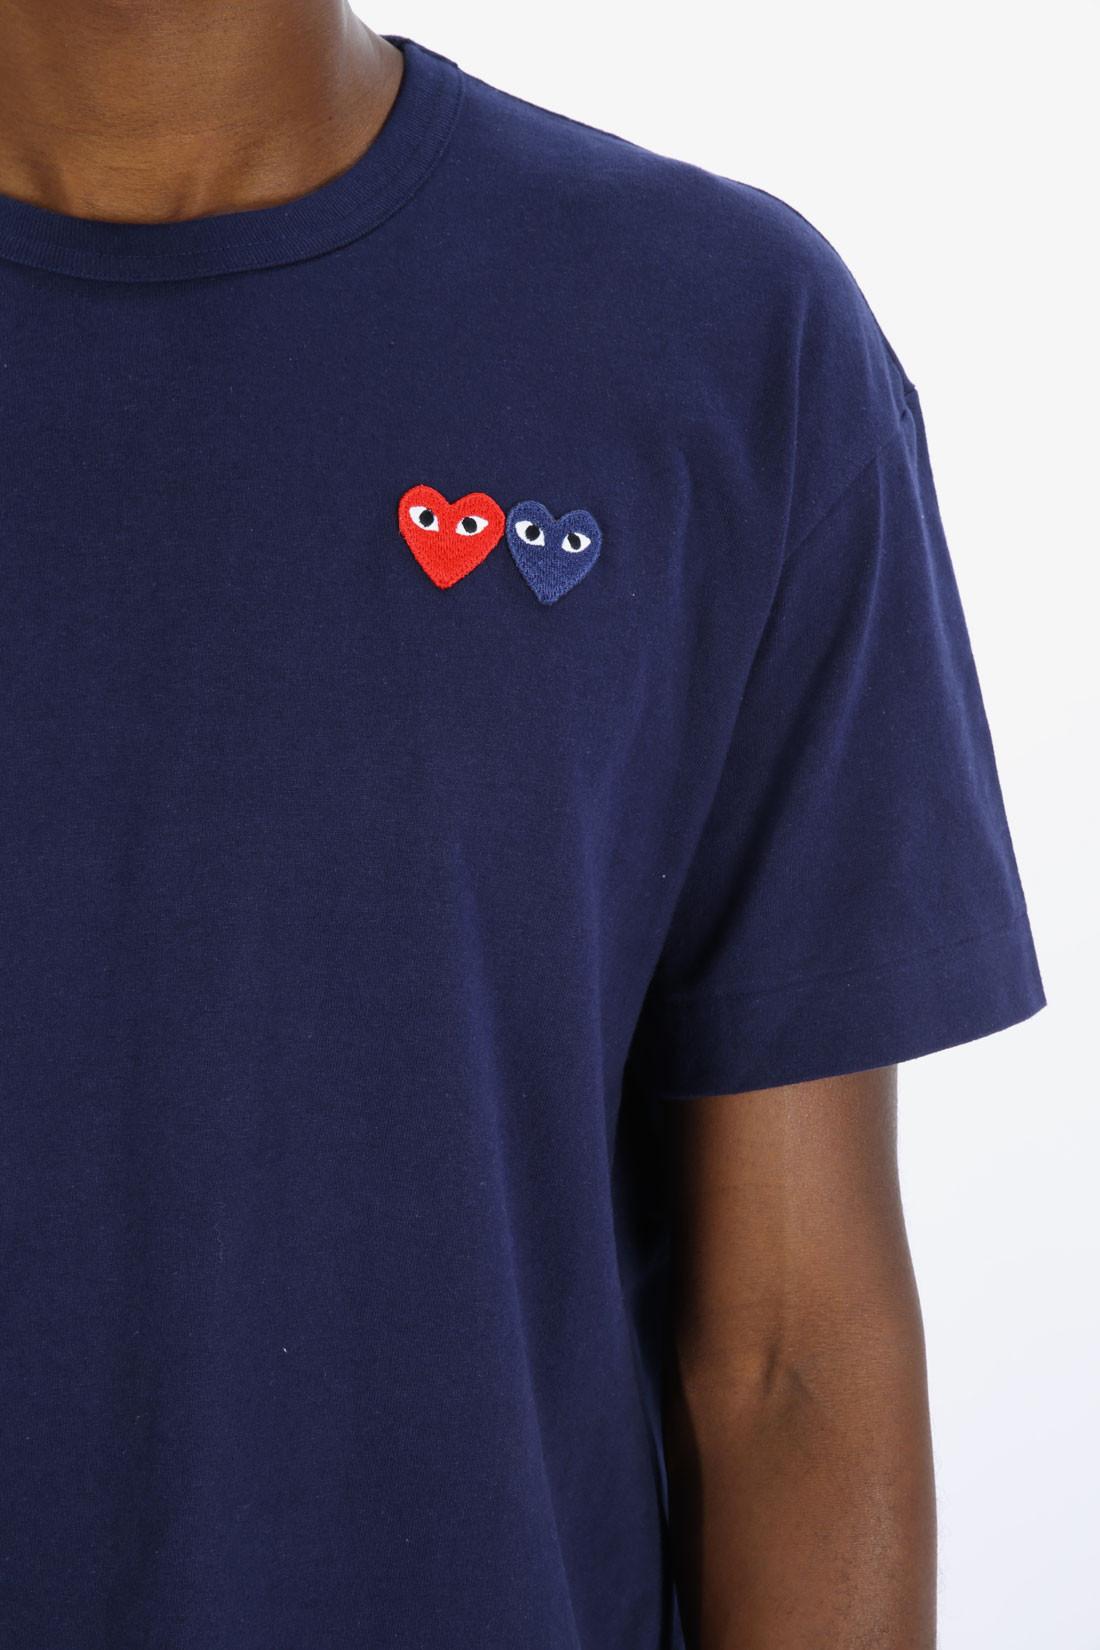 COMME DES GARÇONS PLAY / Play double heart t-shirt Navy